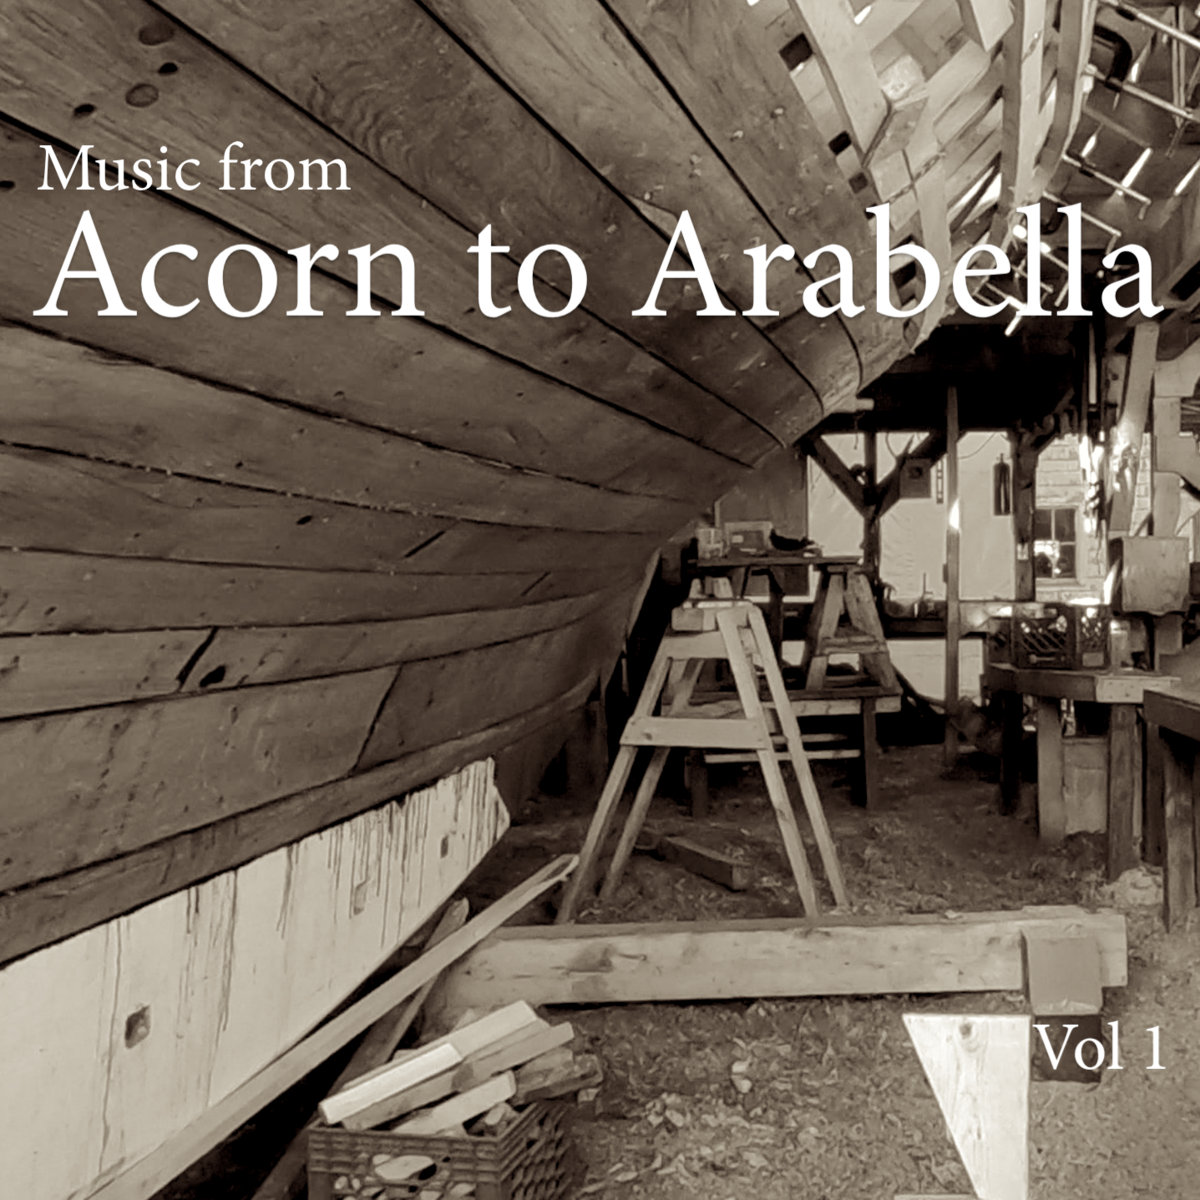 acorn to arabella volume 1